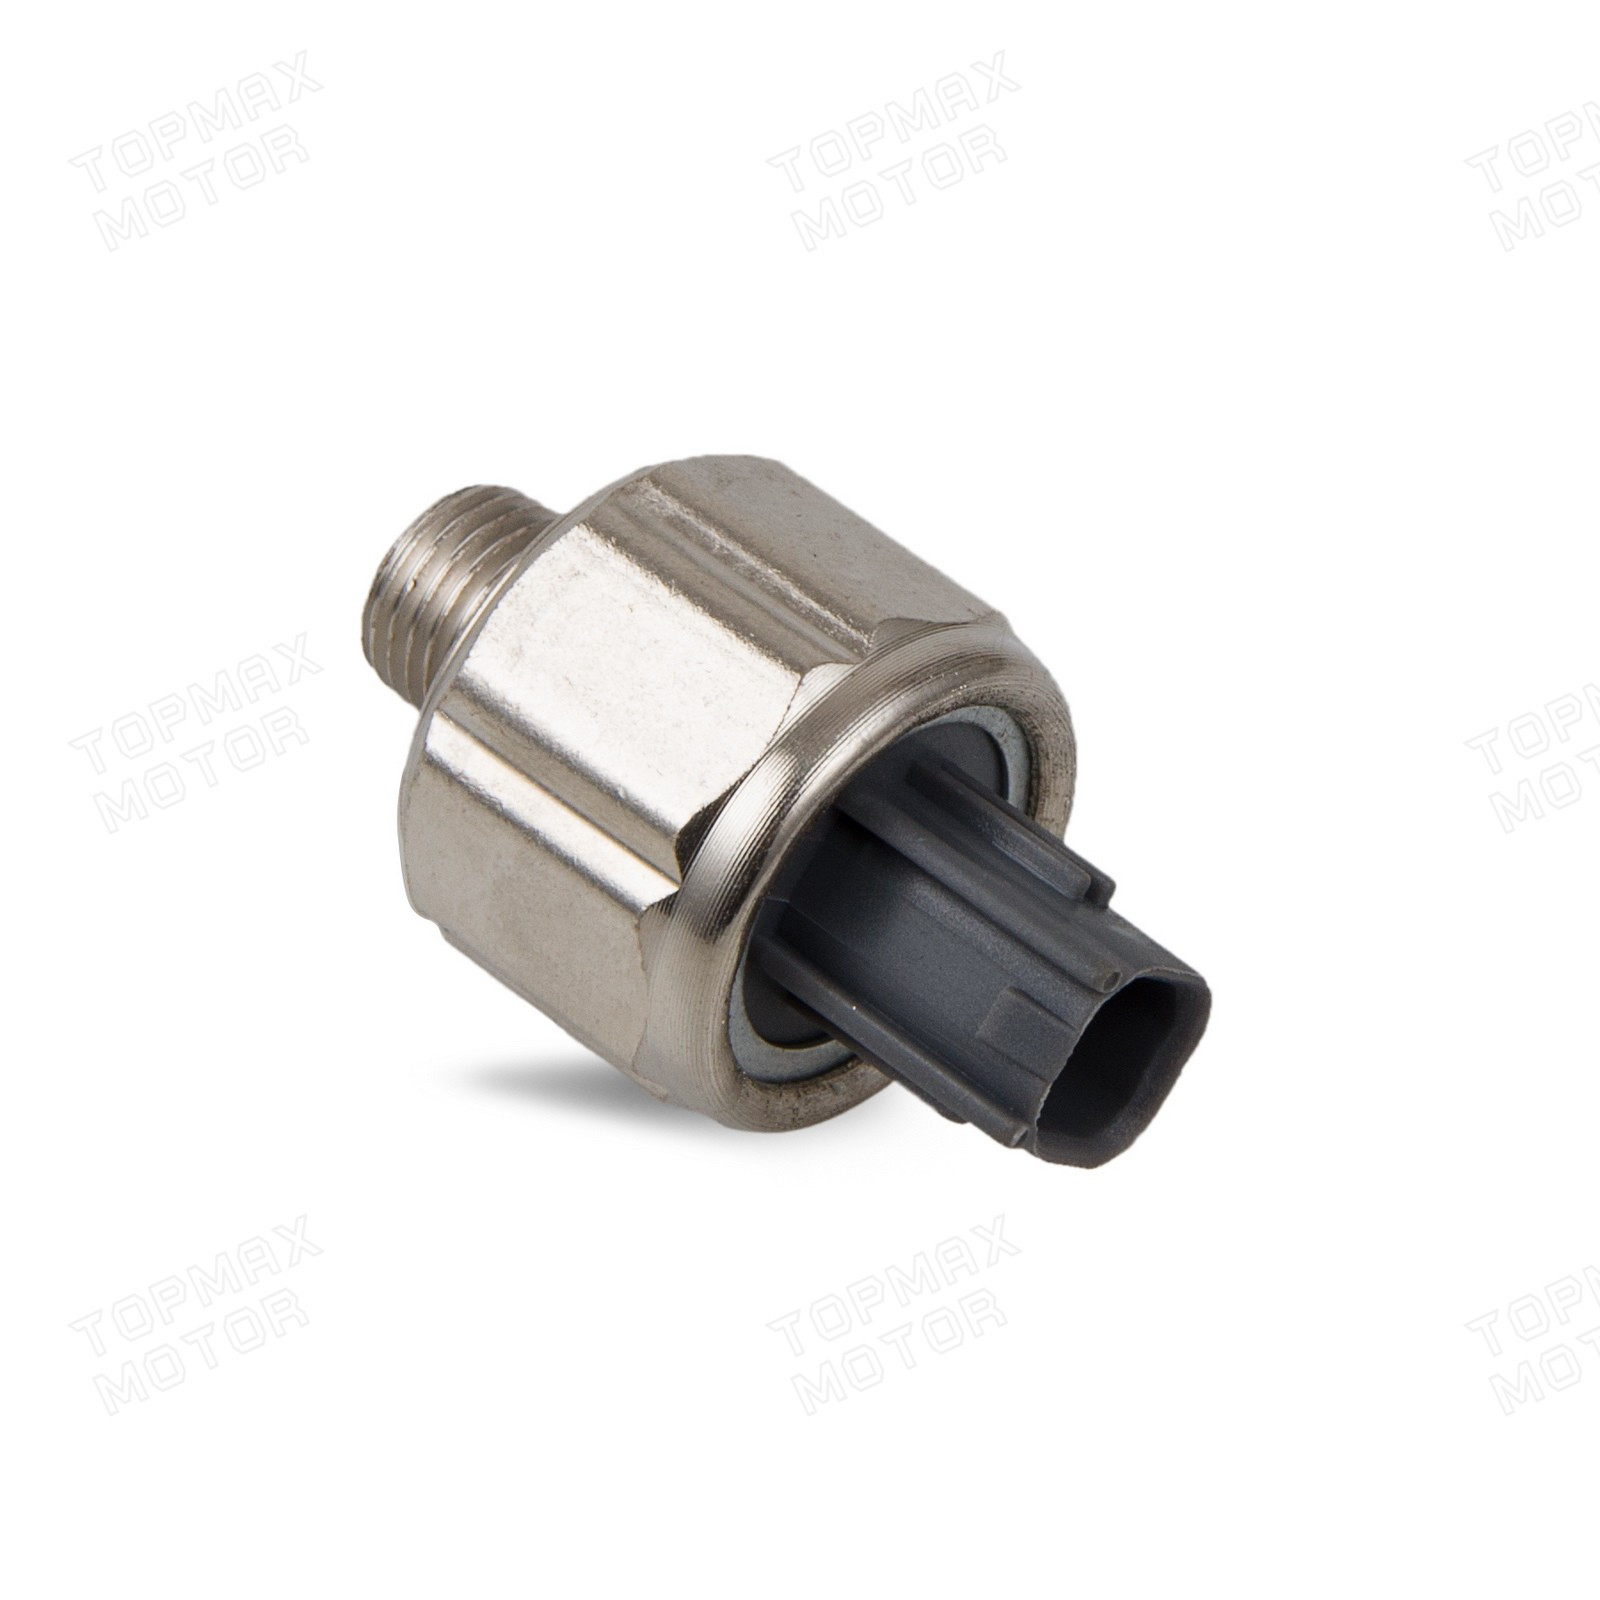 New Knock Sensor 30530 PPL A01 For Honda Acura 30530 PNA